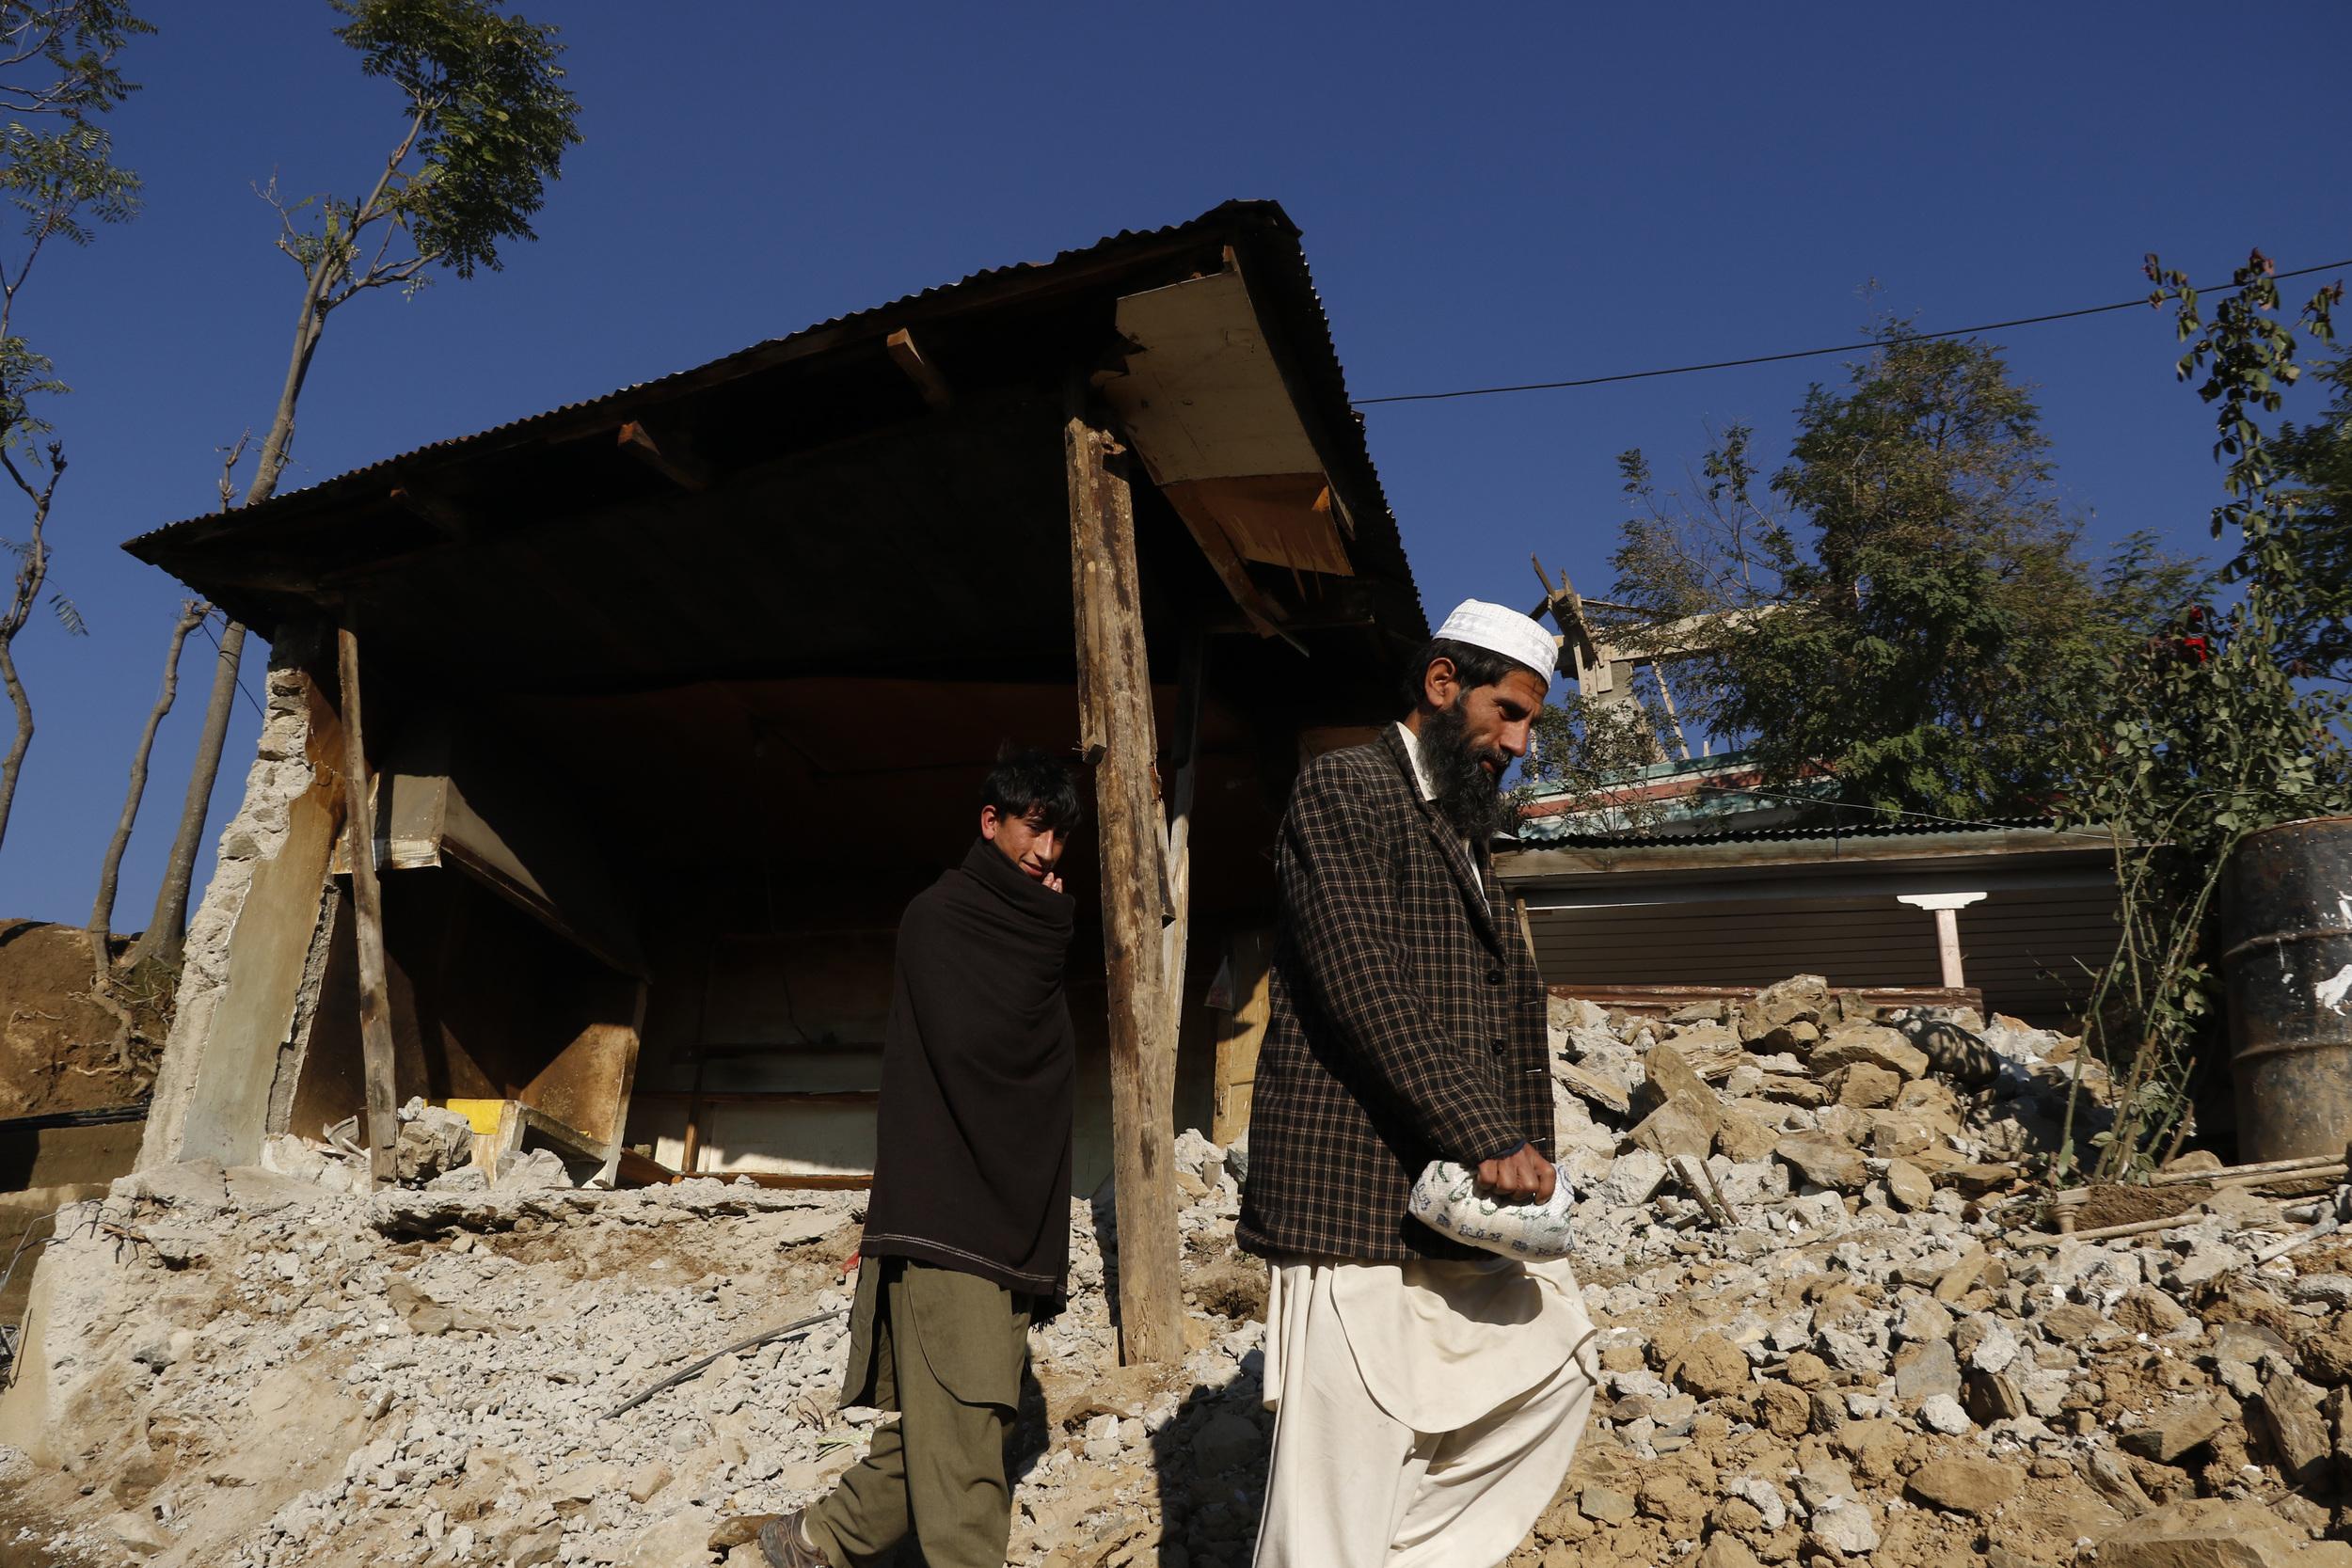 KPK Pak Earthquake Damage 1.jpg